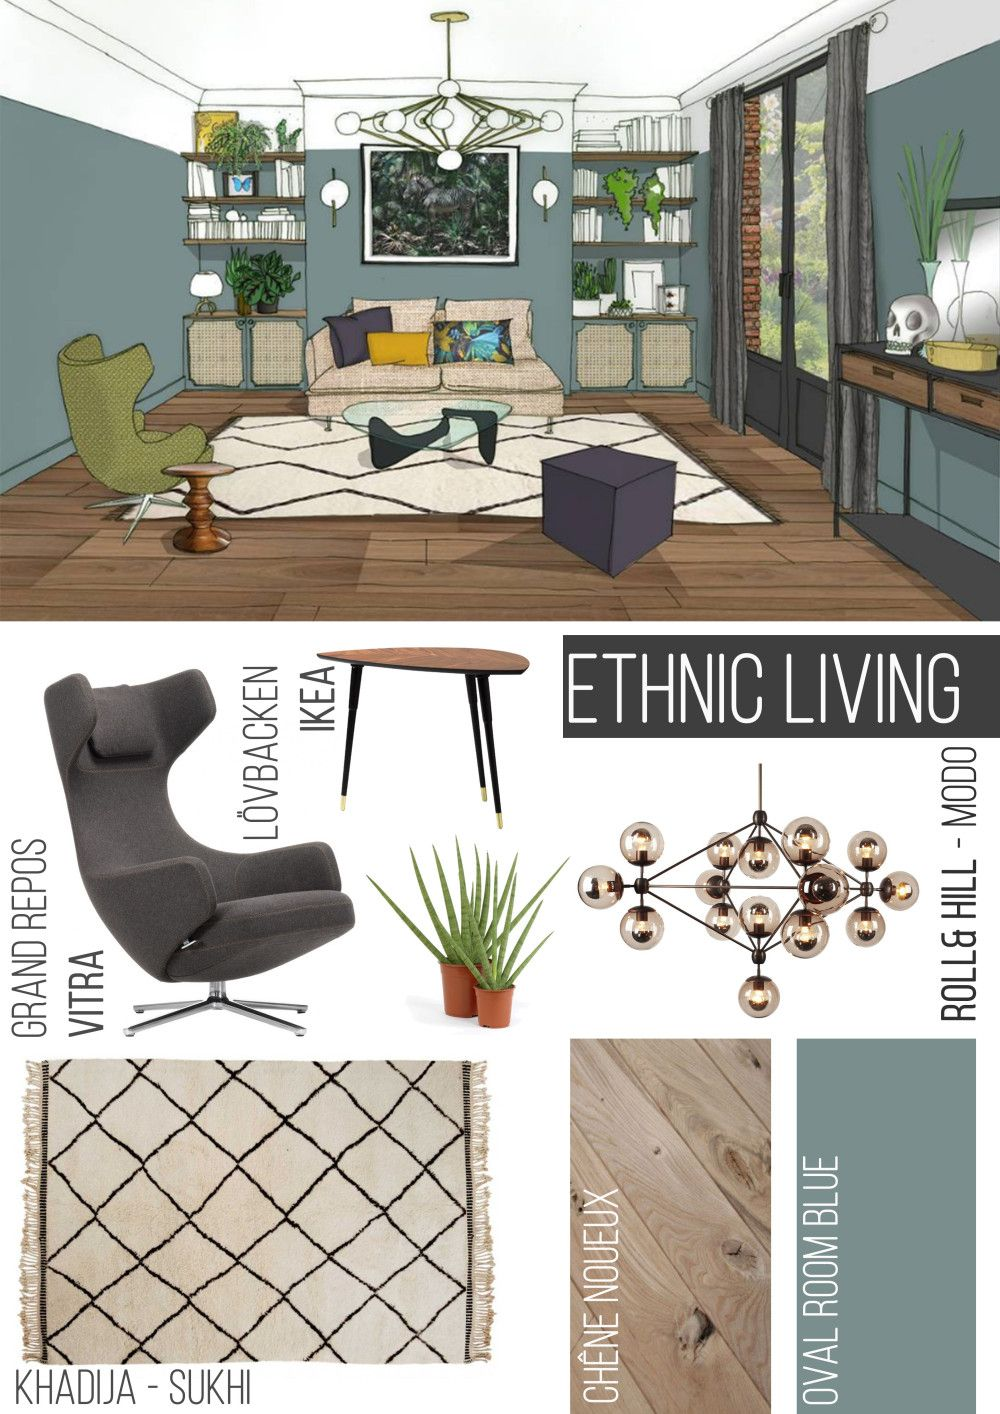 ethnic interior sur interior ethnic boho. Black Bedroom Furniture Sets. Home Design Ideas